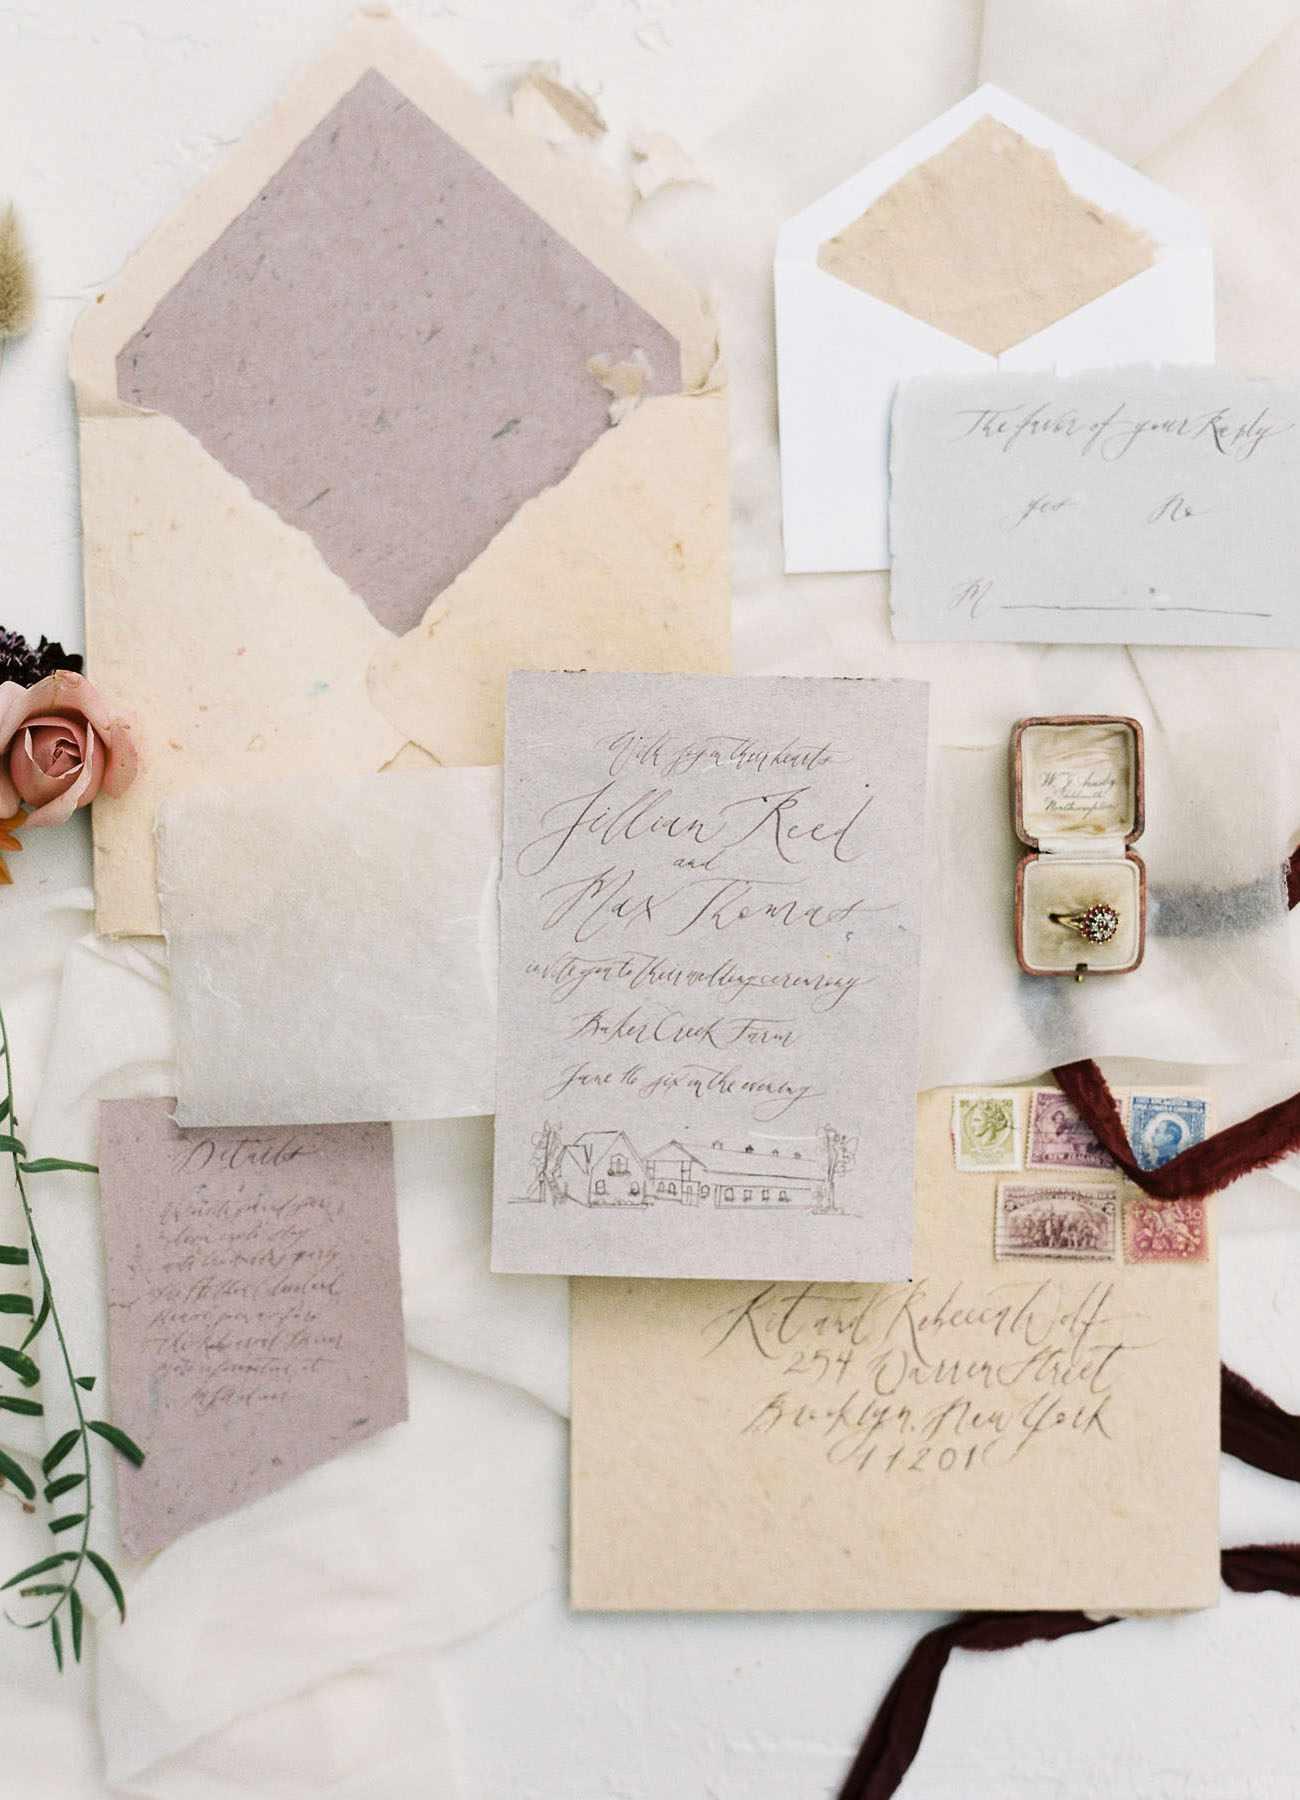 Wedding invitations with calligraphy.